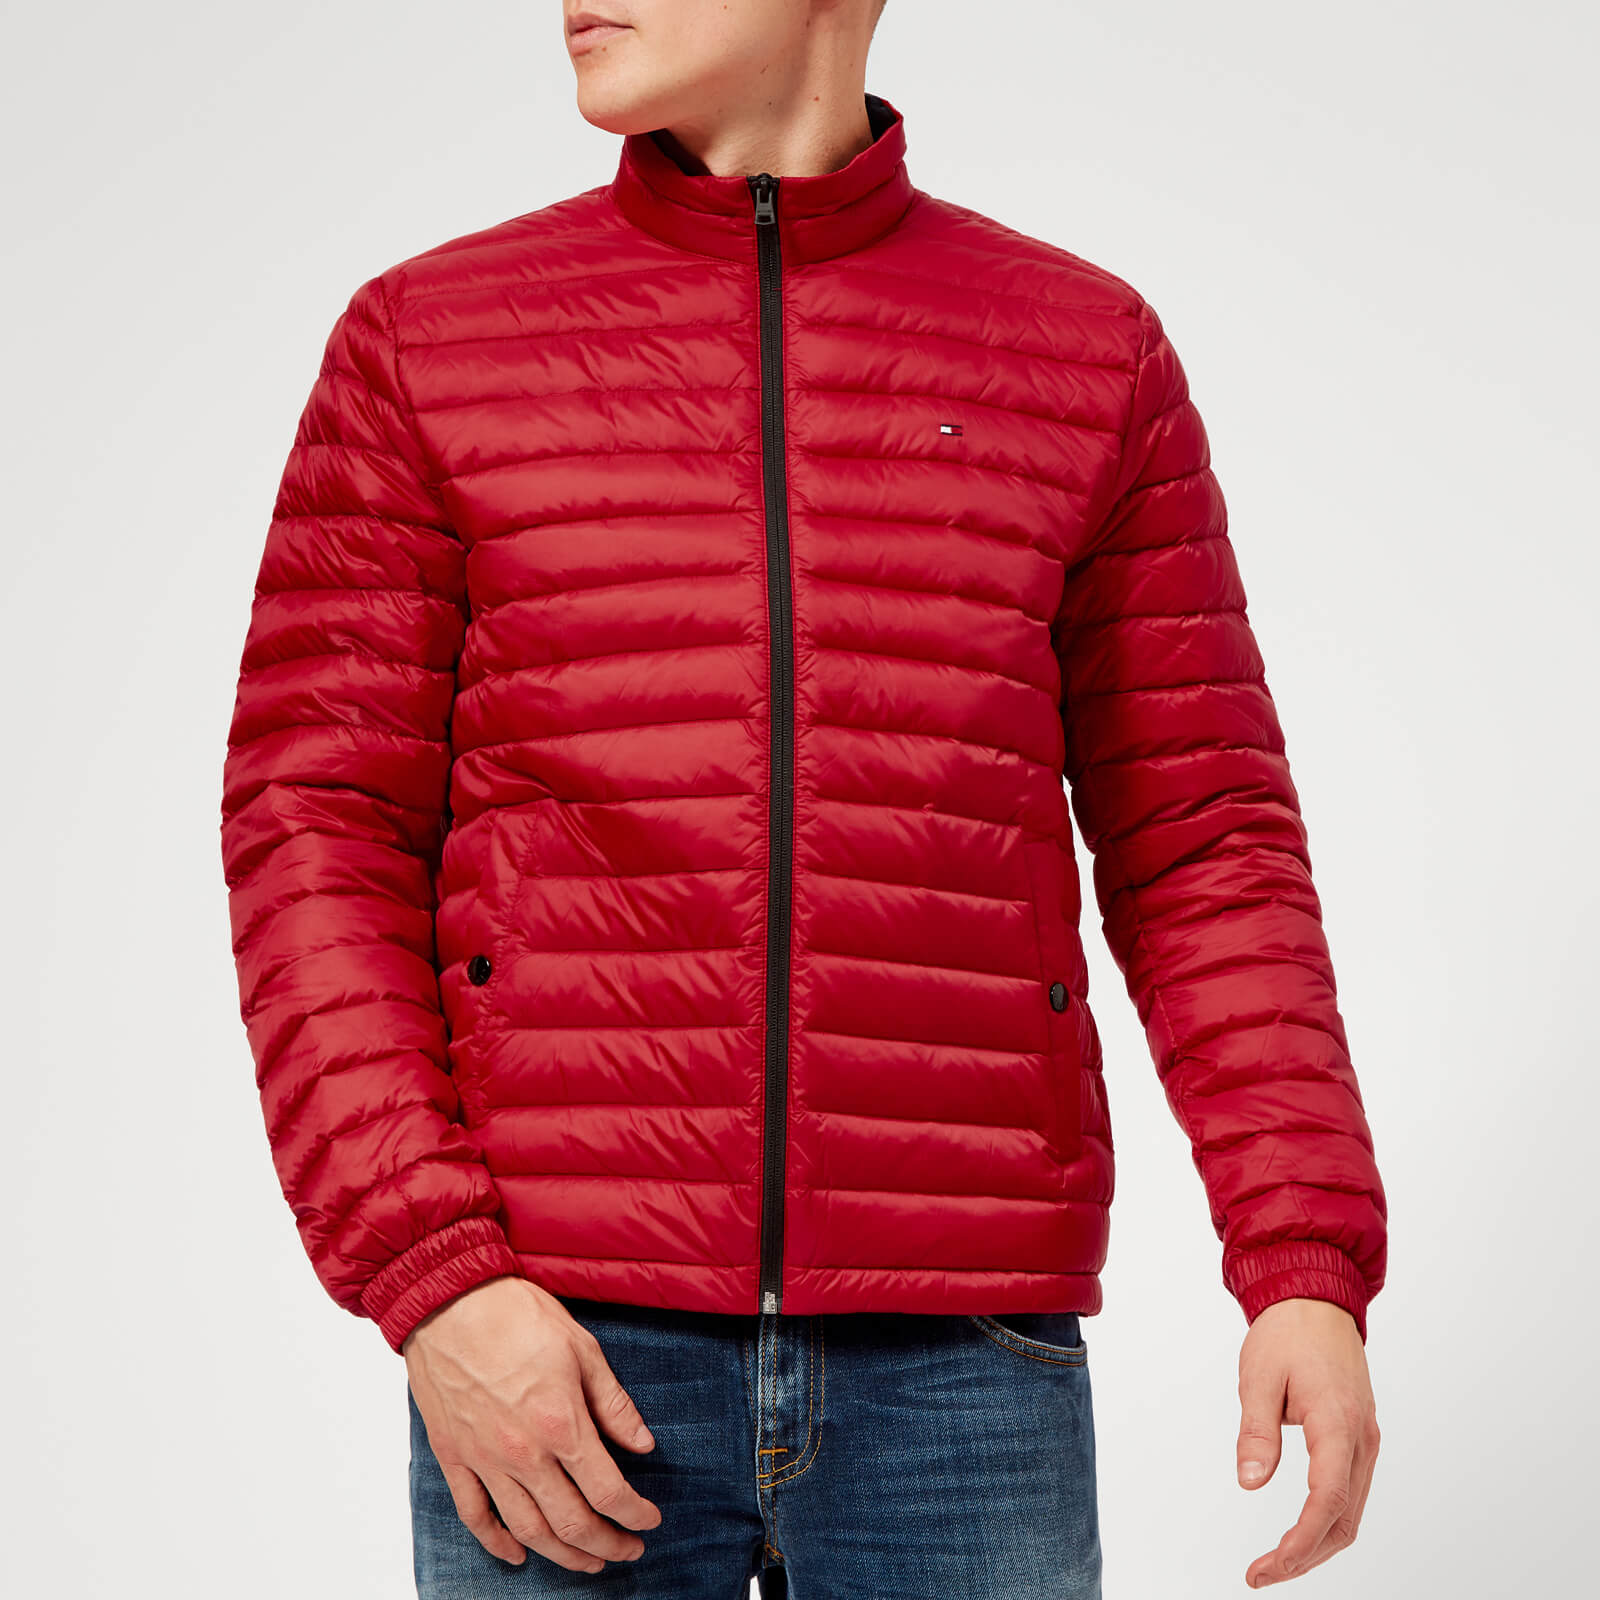 9f293c62 Tommy Hilfiger Men's Lightweight Packable Down Jacket - Haute Red Clothing  | TheHut.com